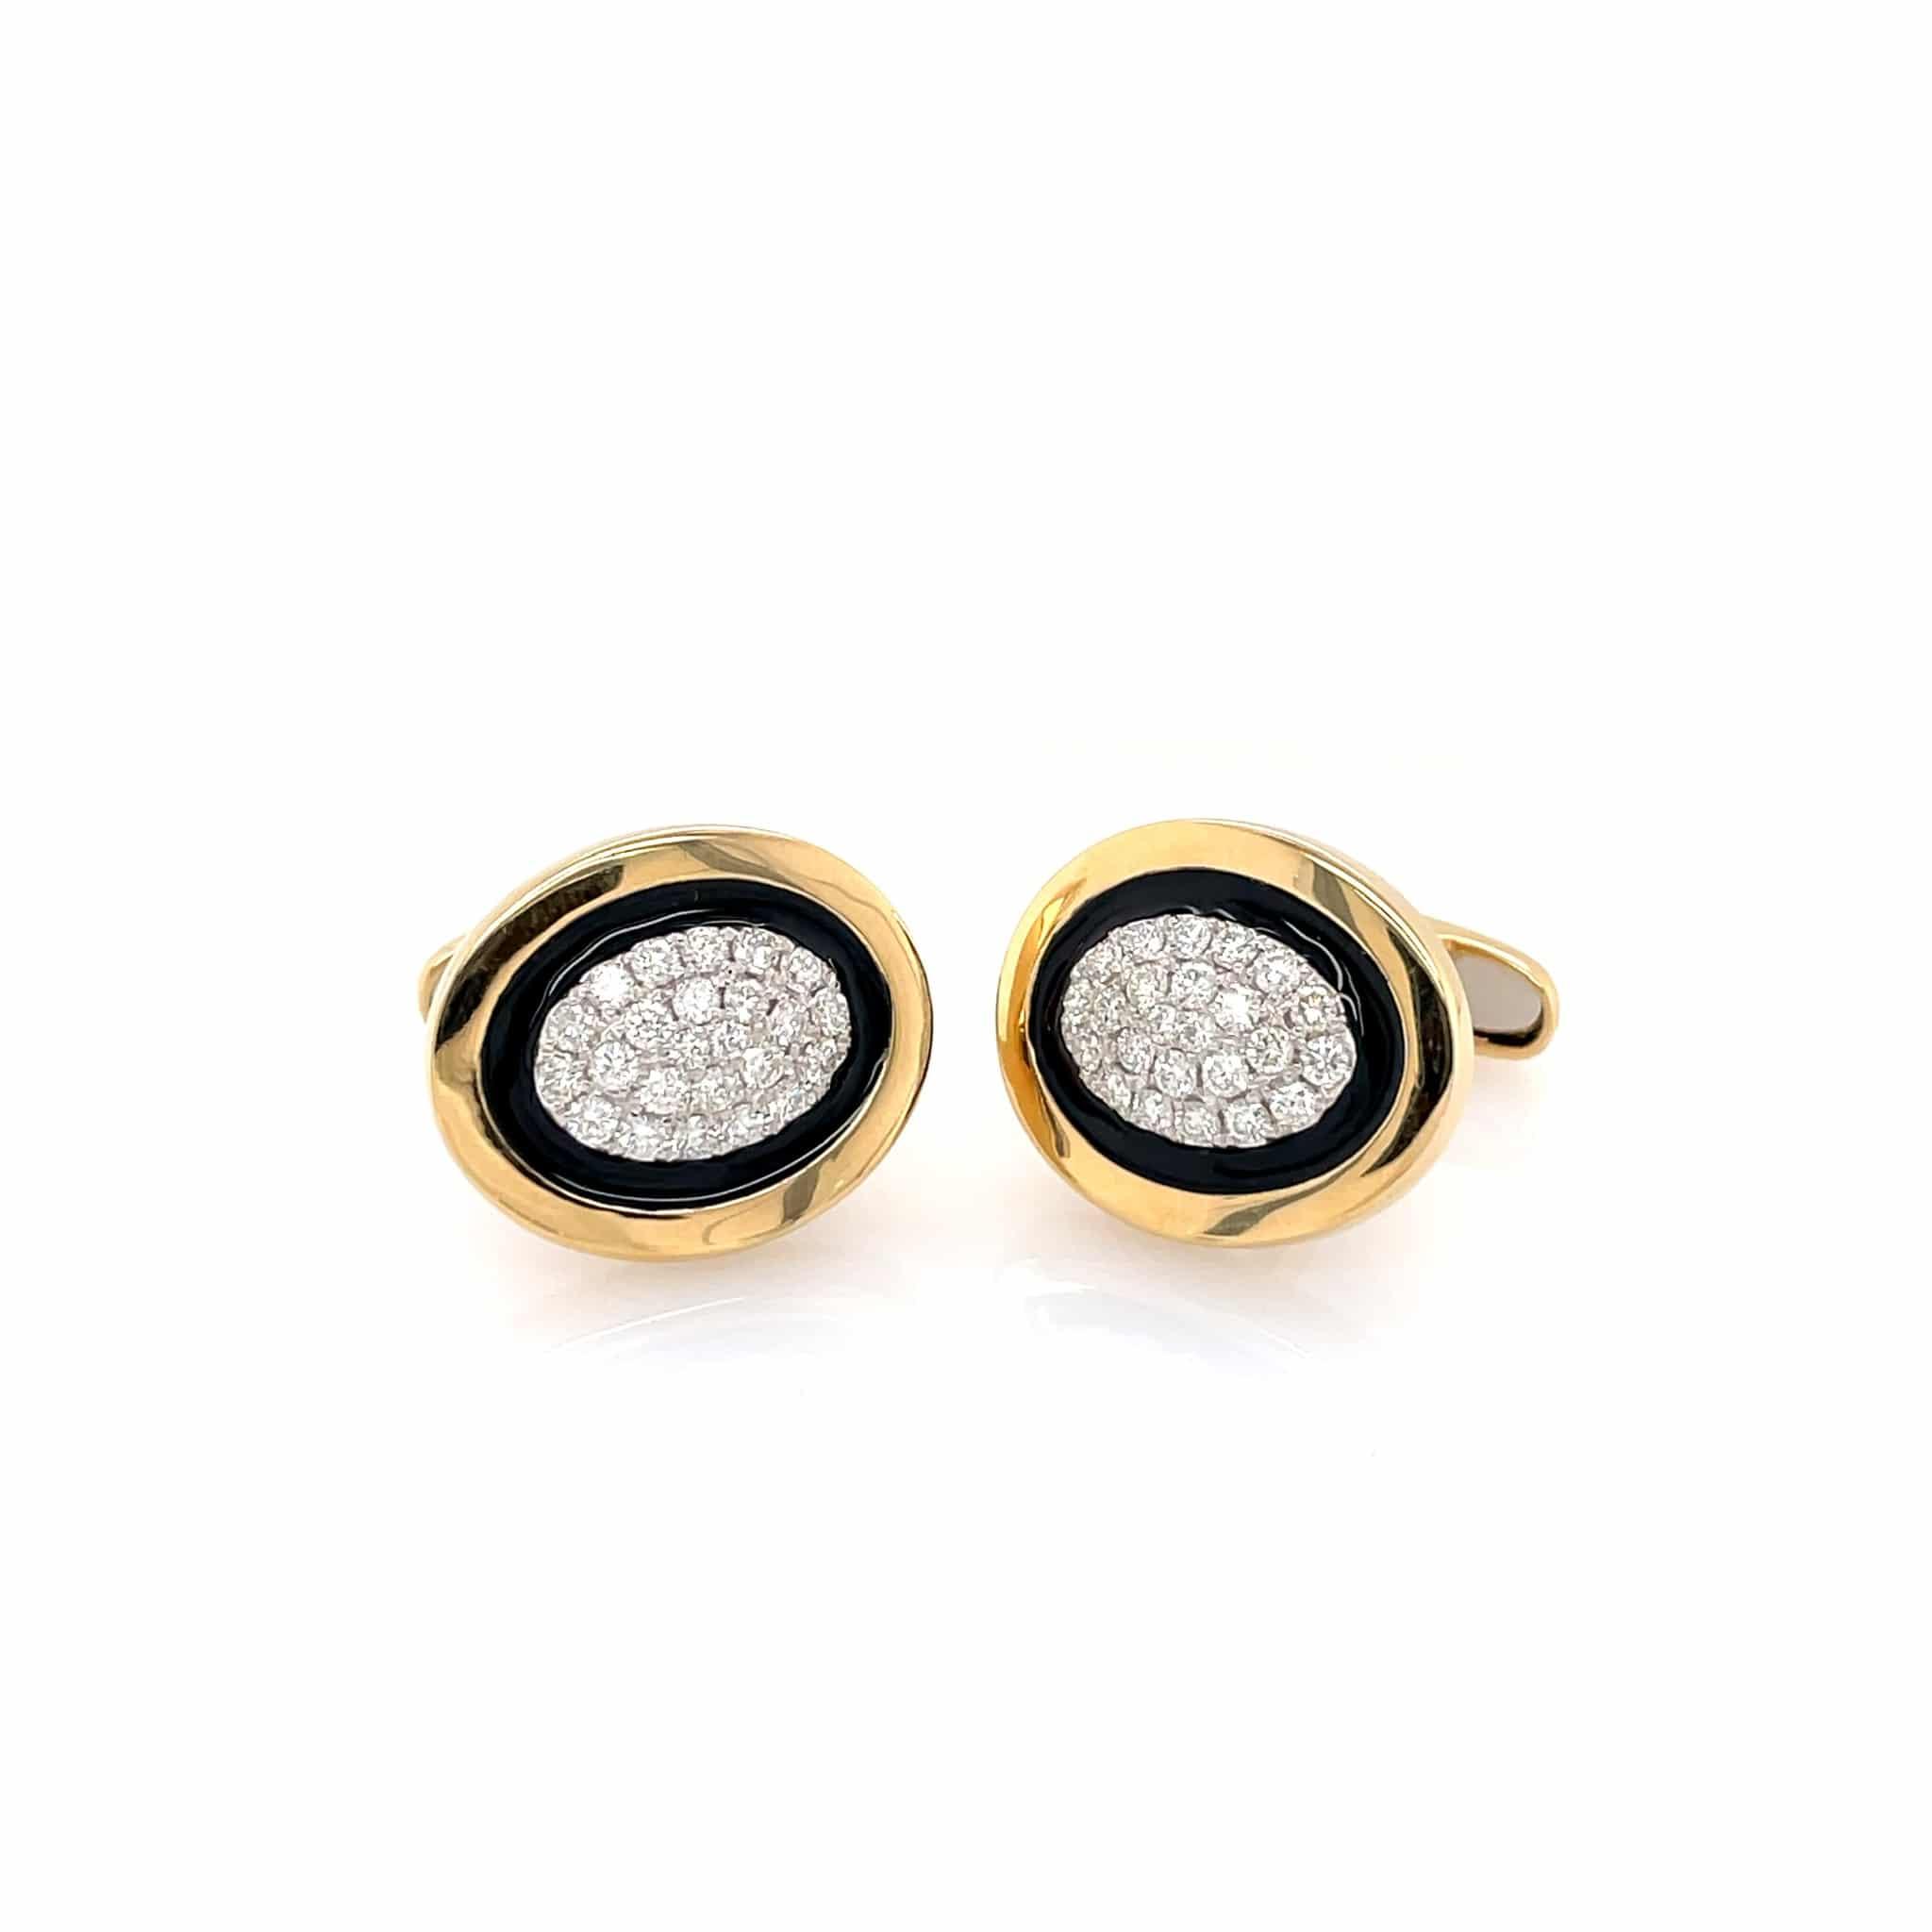 Yellow Gold, Black Enamel and Diamond Cufflinks